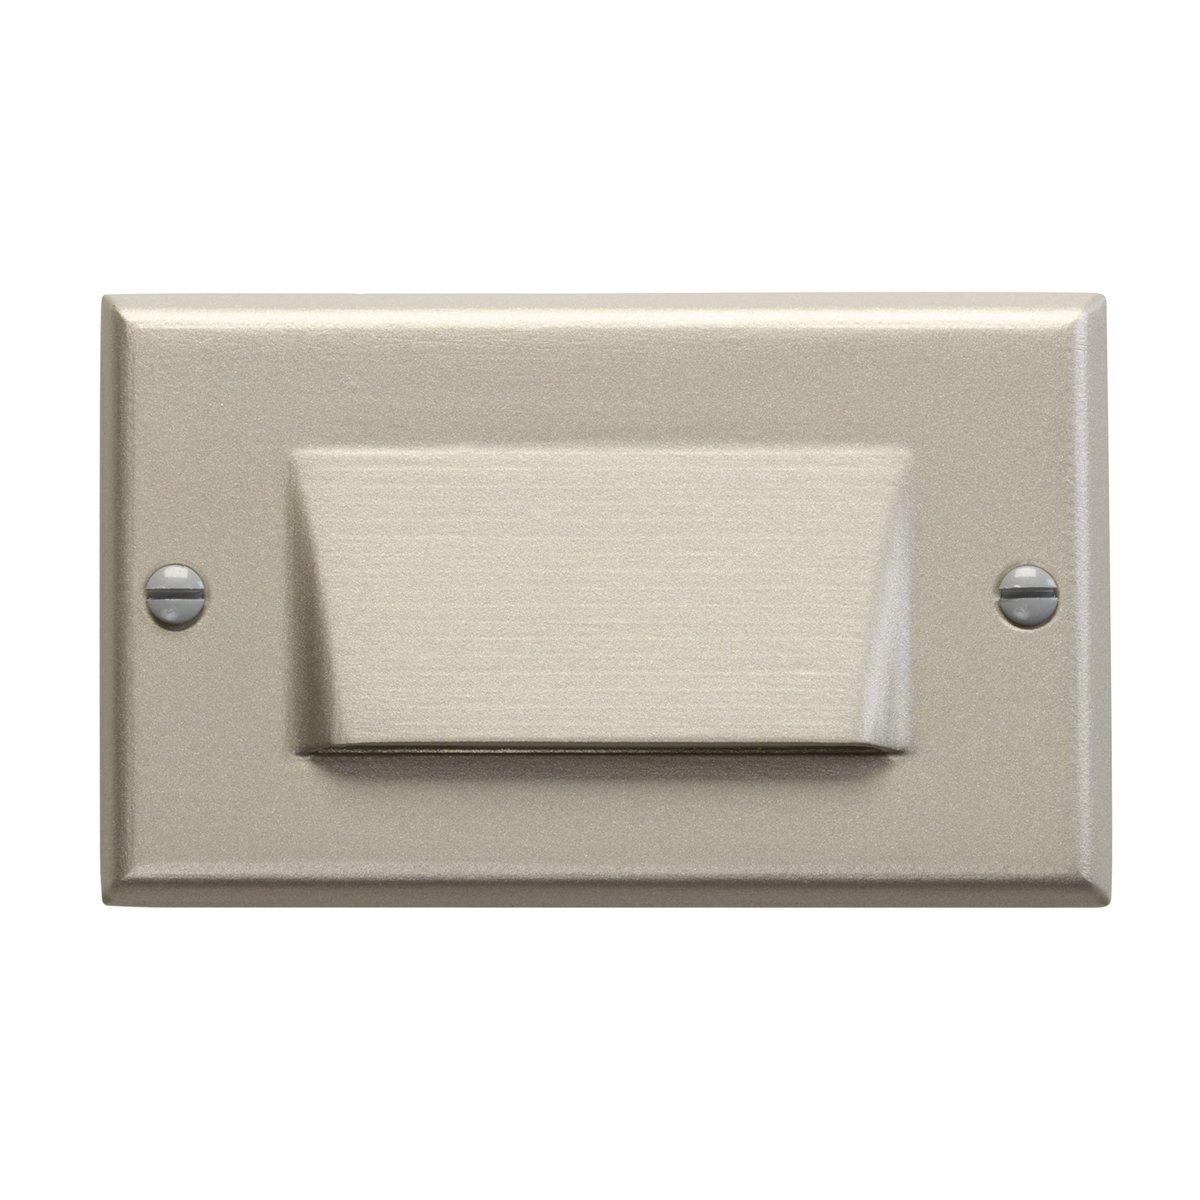 Kichler 12602NI Design Pro Shielded Face 120-volt LED Step and Hall Light, Brushed Nickel Finish